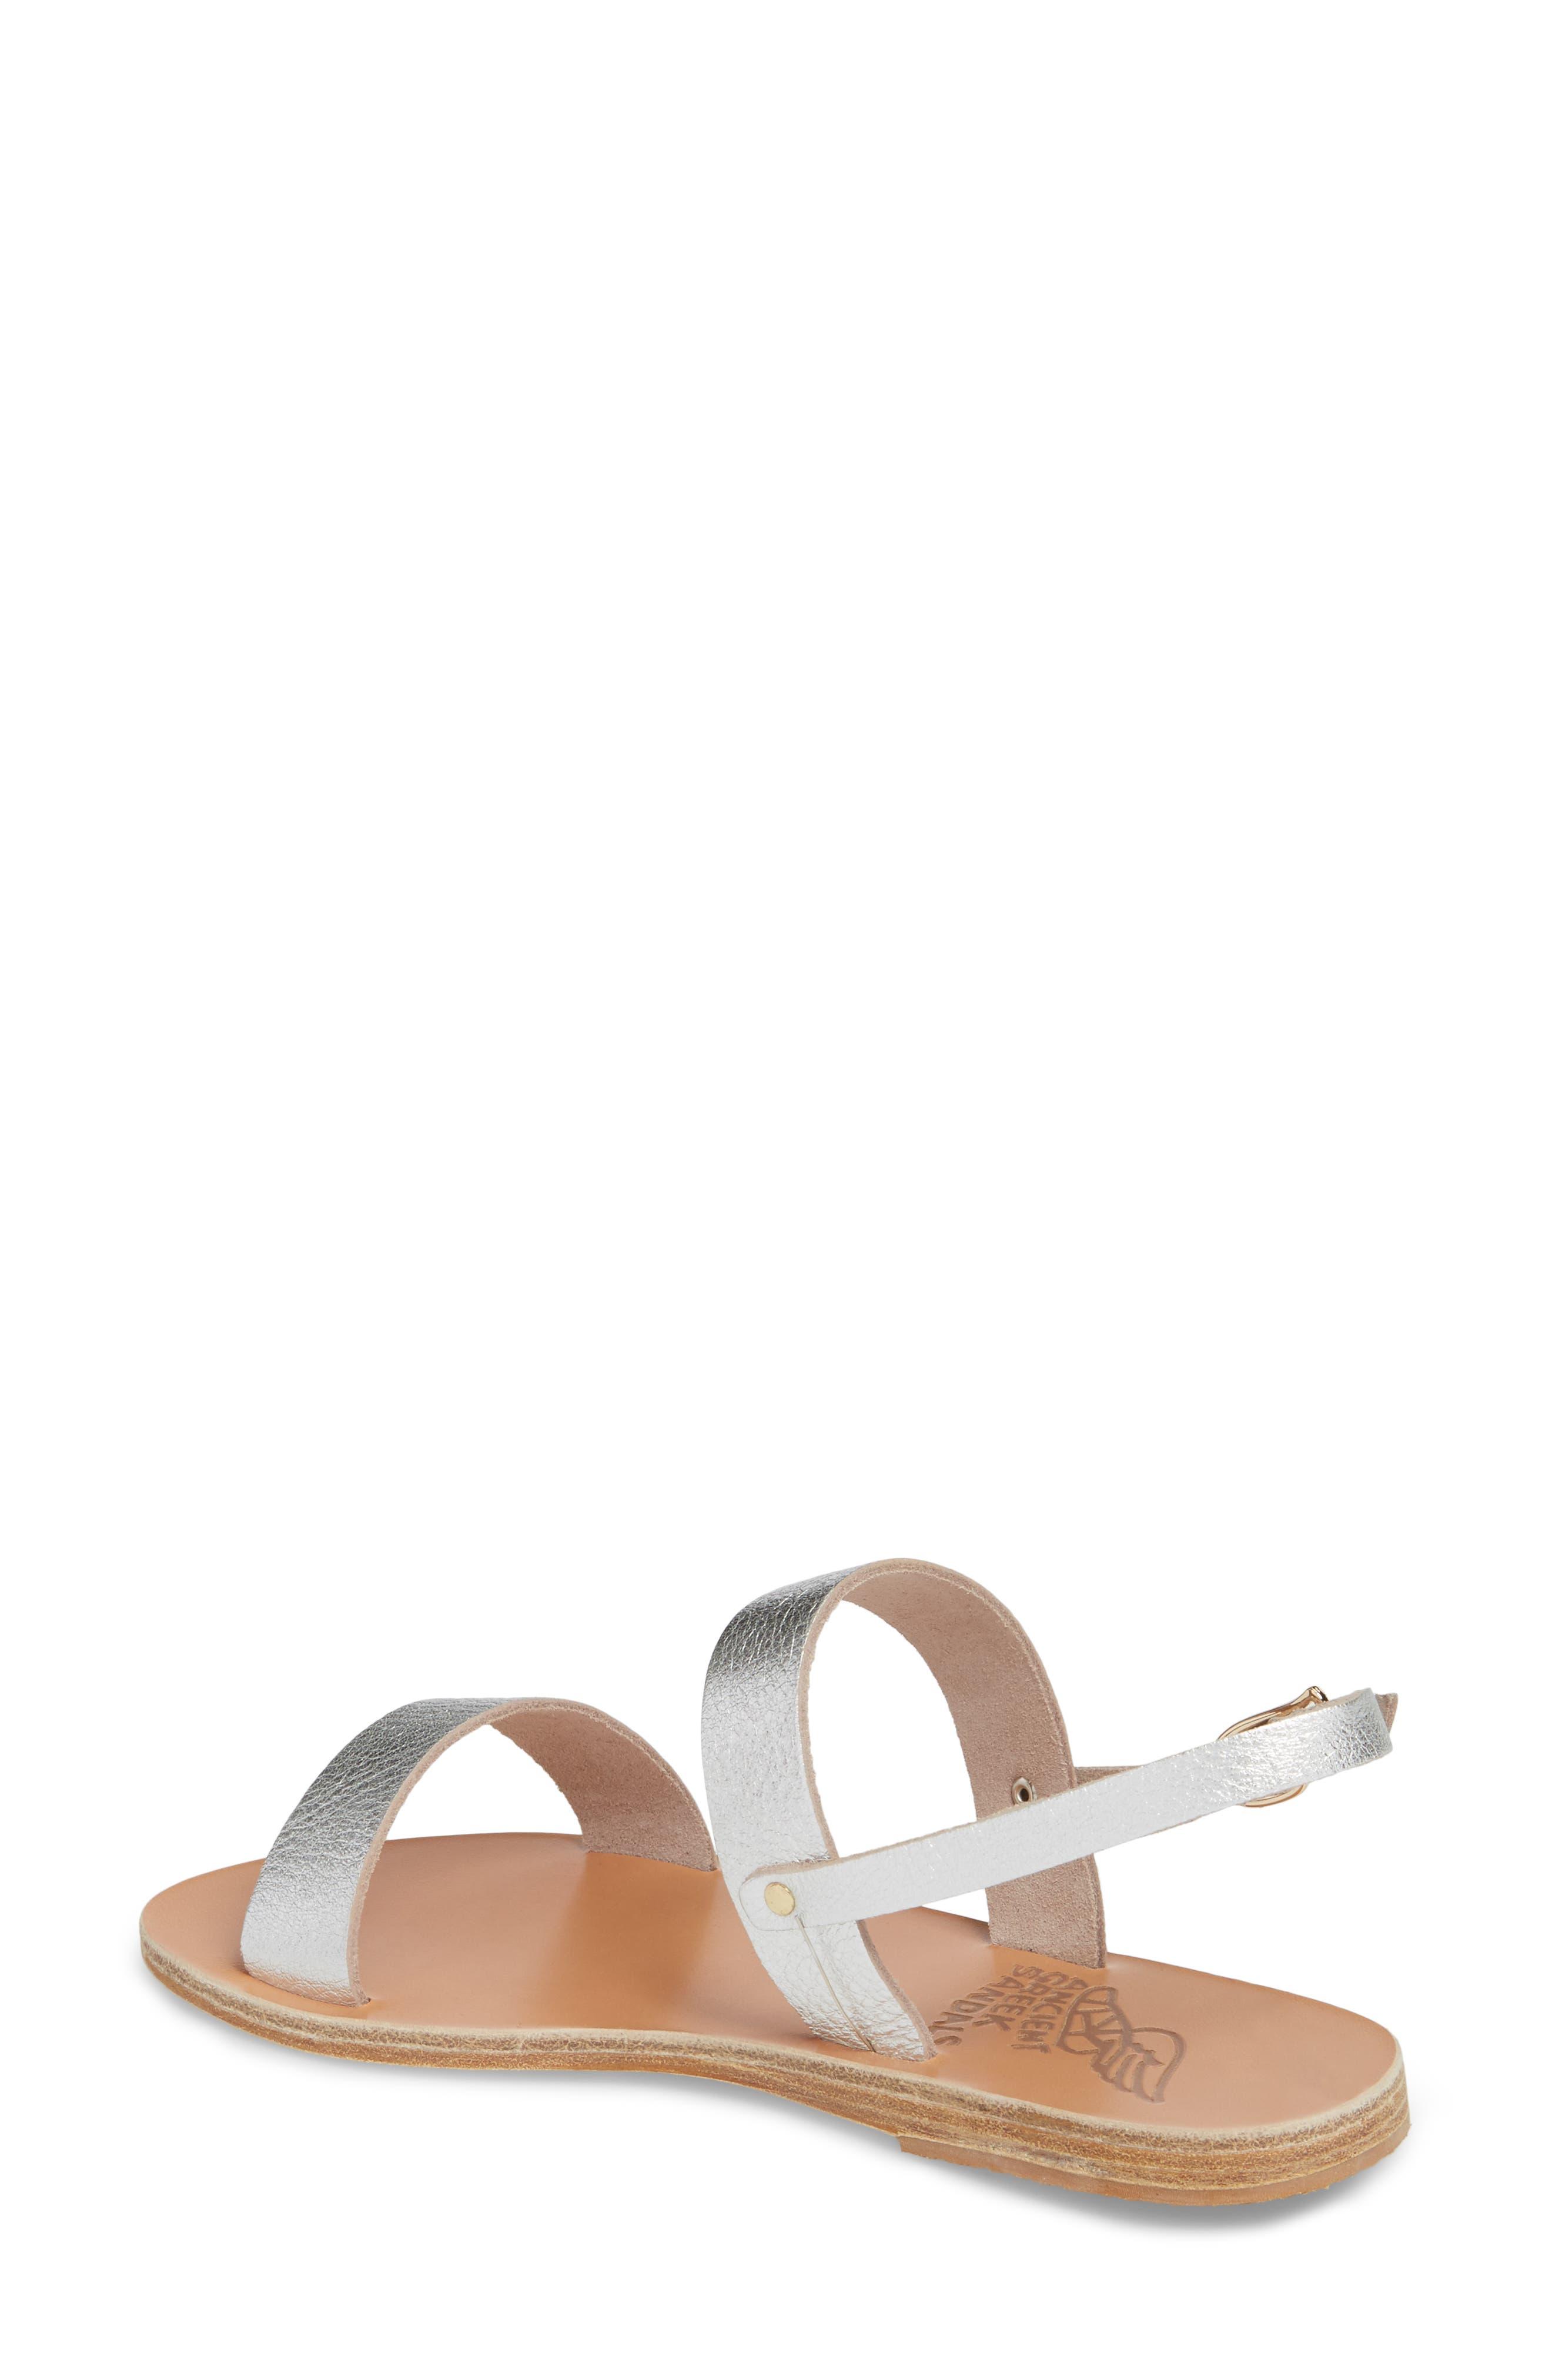 Clio Slingback Sandal,                             Alternate thumbnail 2, color,                             041